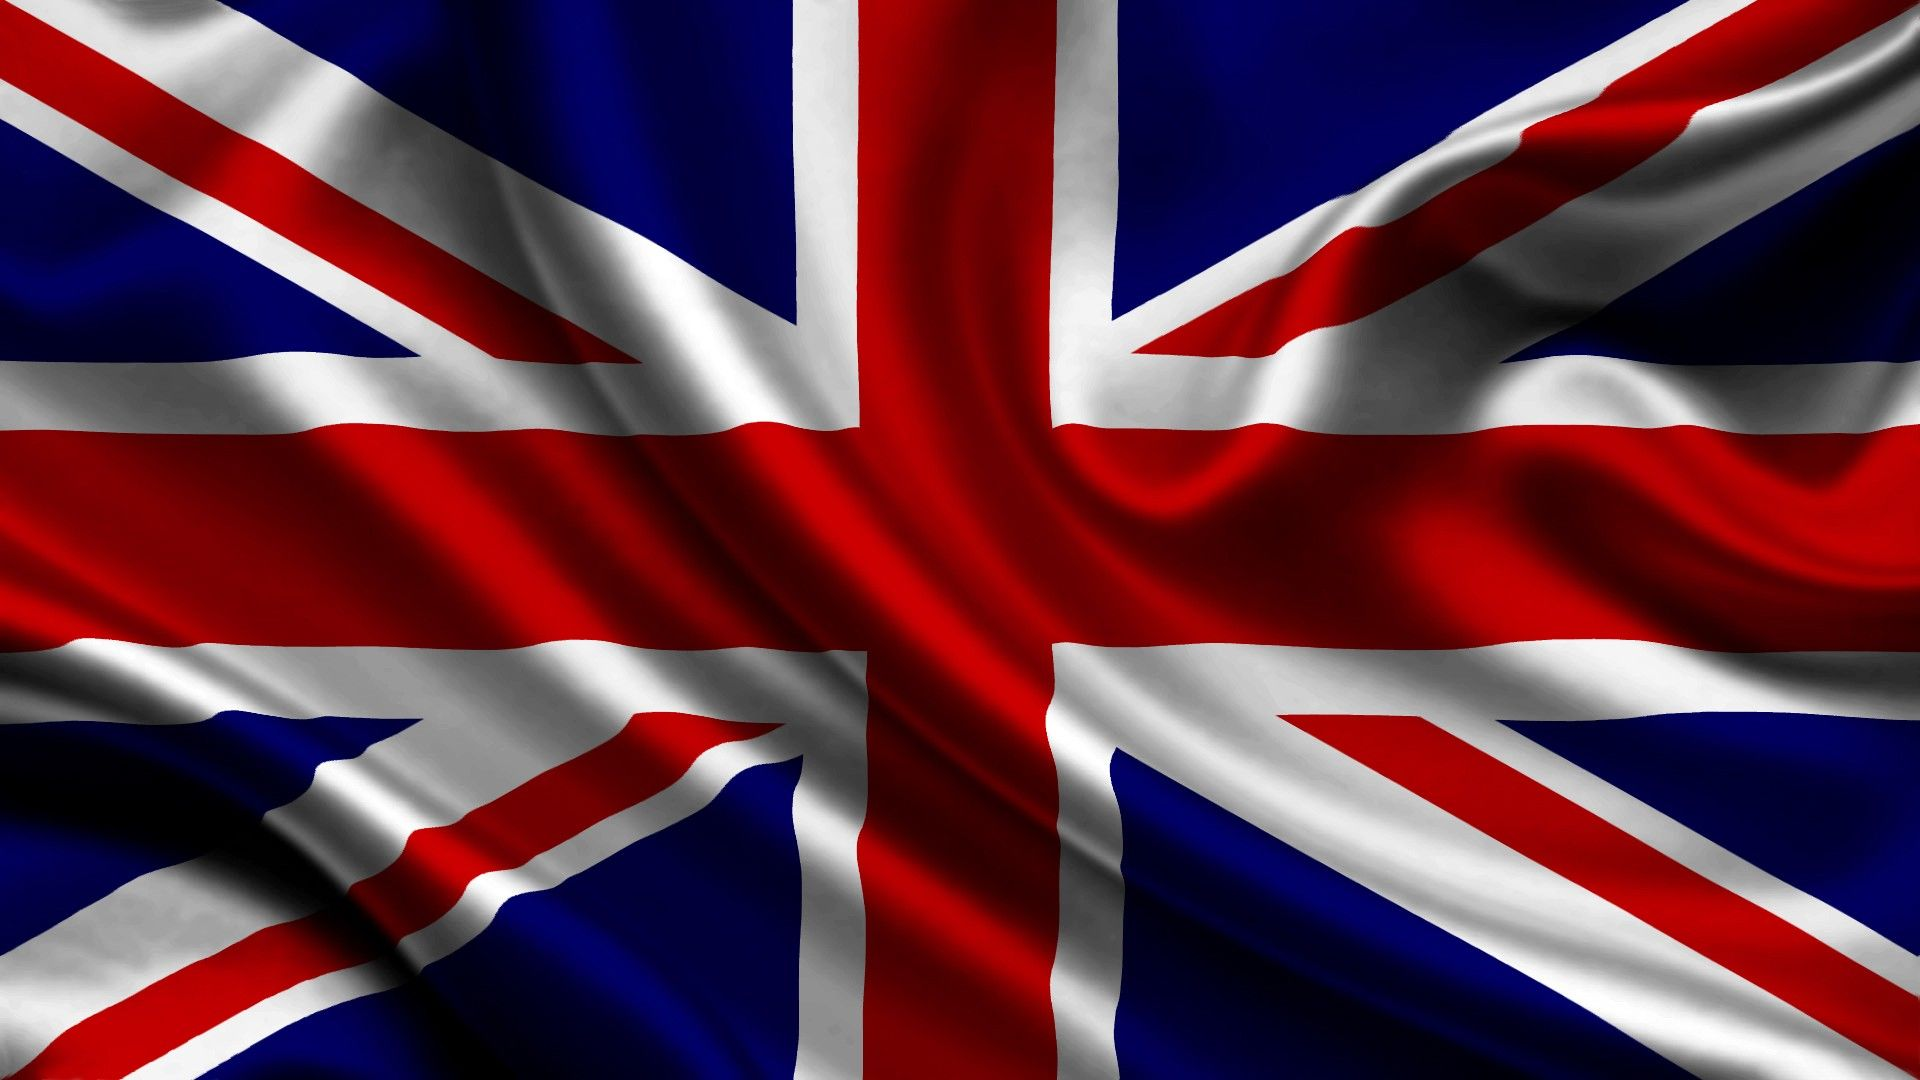 British Flag Wallpaper Flag Pinterest Britain England And British